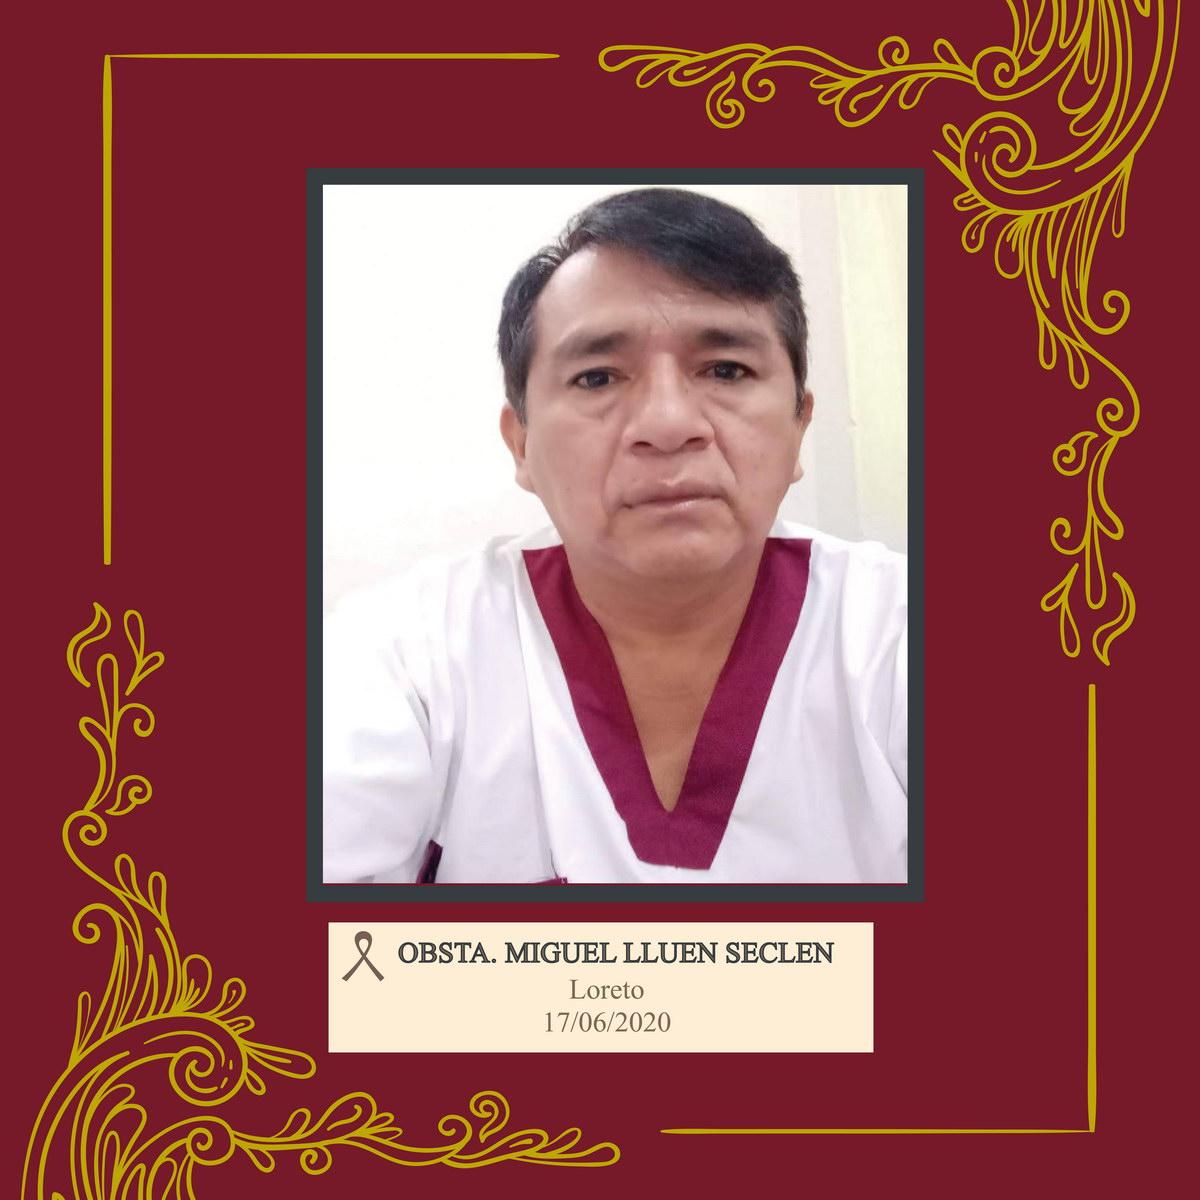 Miguel Ángel Lluen Seclén